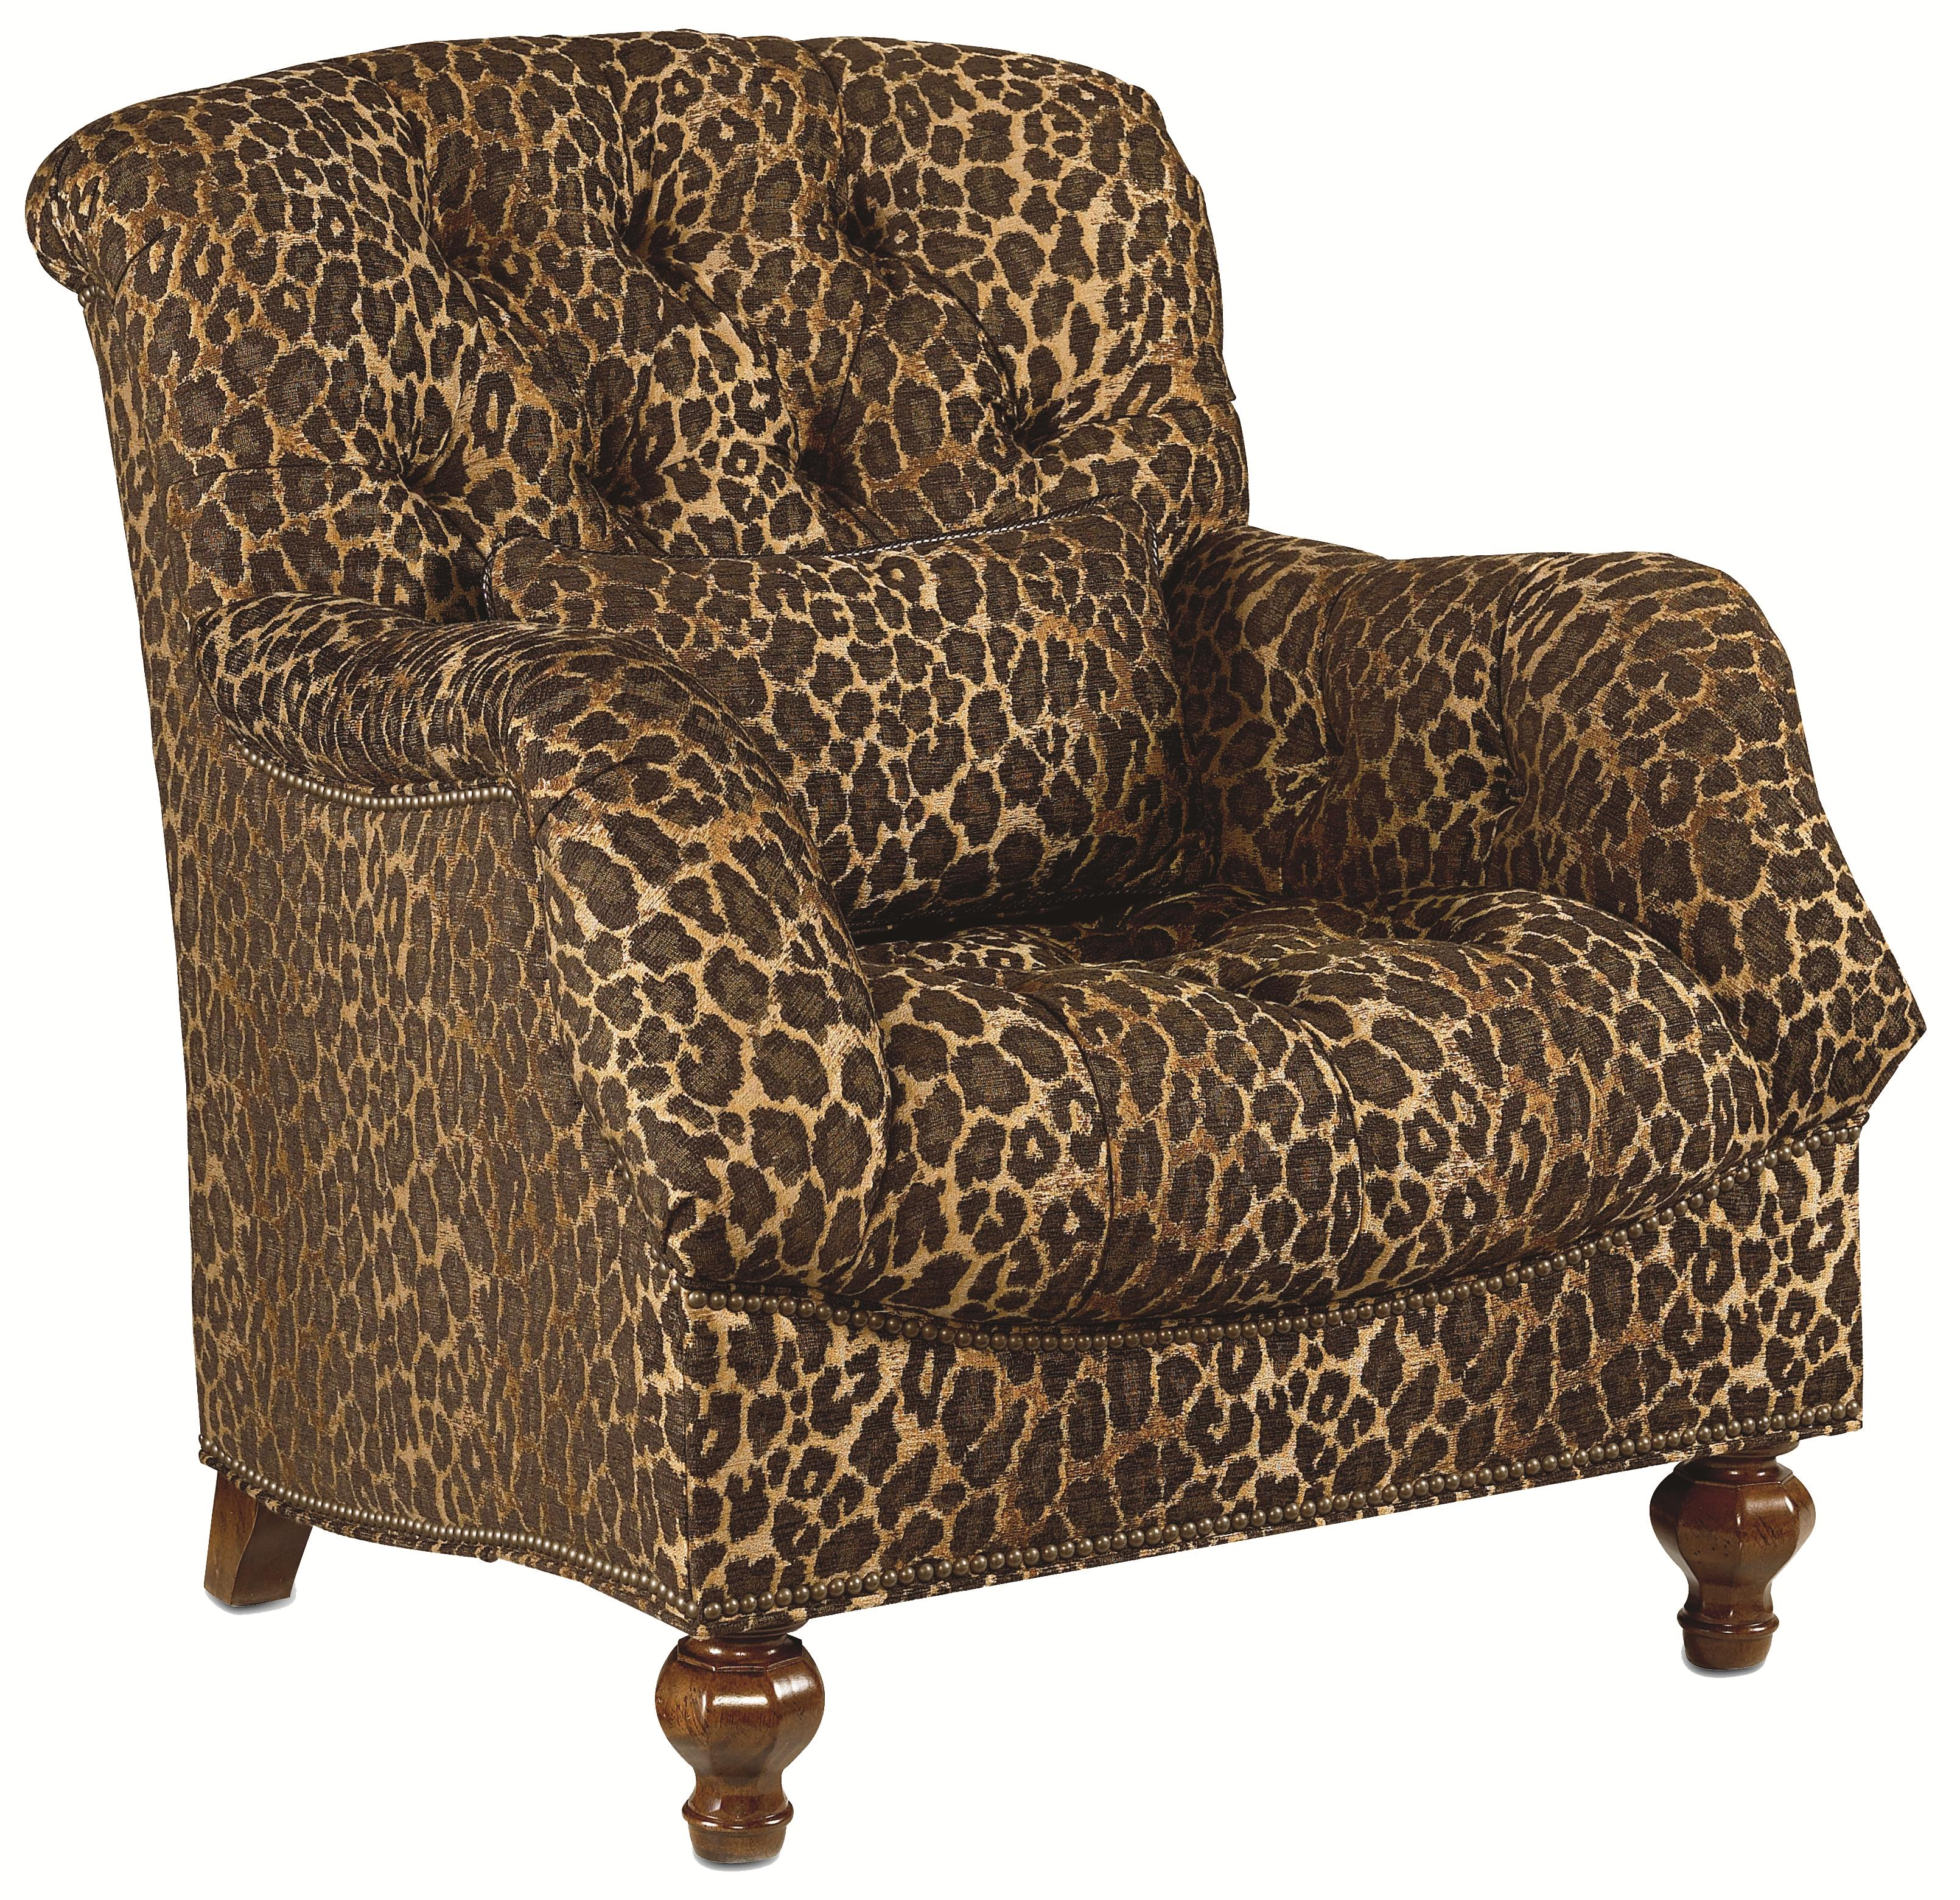 Thomasville® Ernest Hemingway 462 Deep Tufted Walden Chair With Nail Head  Trim   Sprintz Furniture   Upholstered Chair Nashville, Franklin, ...